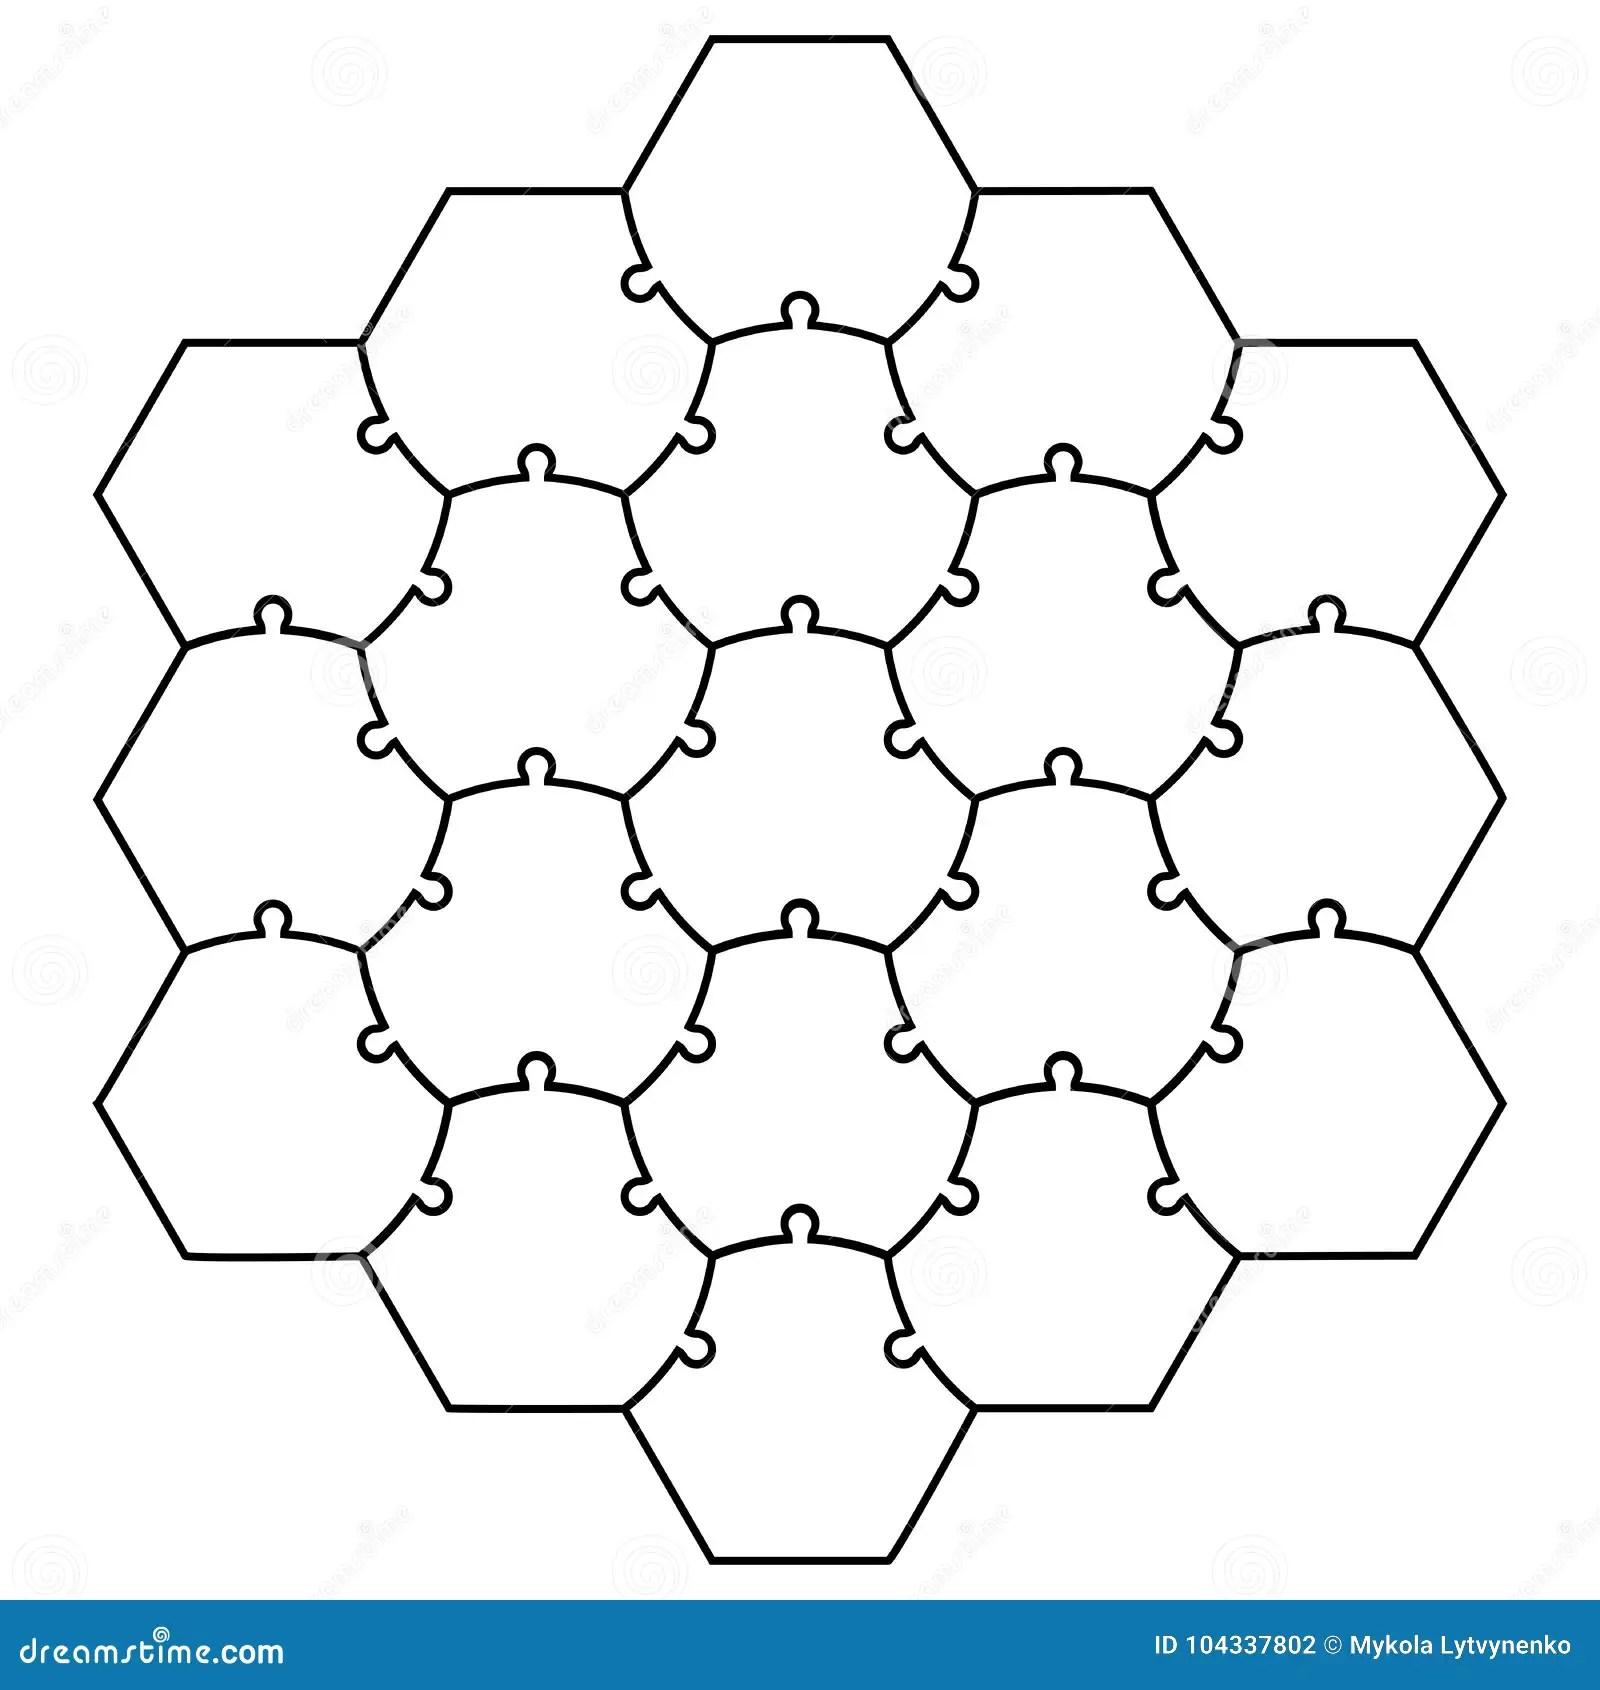 Hexagonal Board Game 3d Illustration Royalty-Free Cartoon